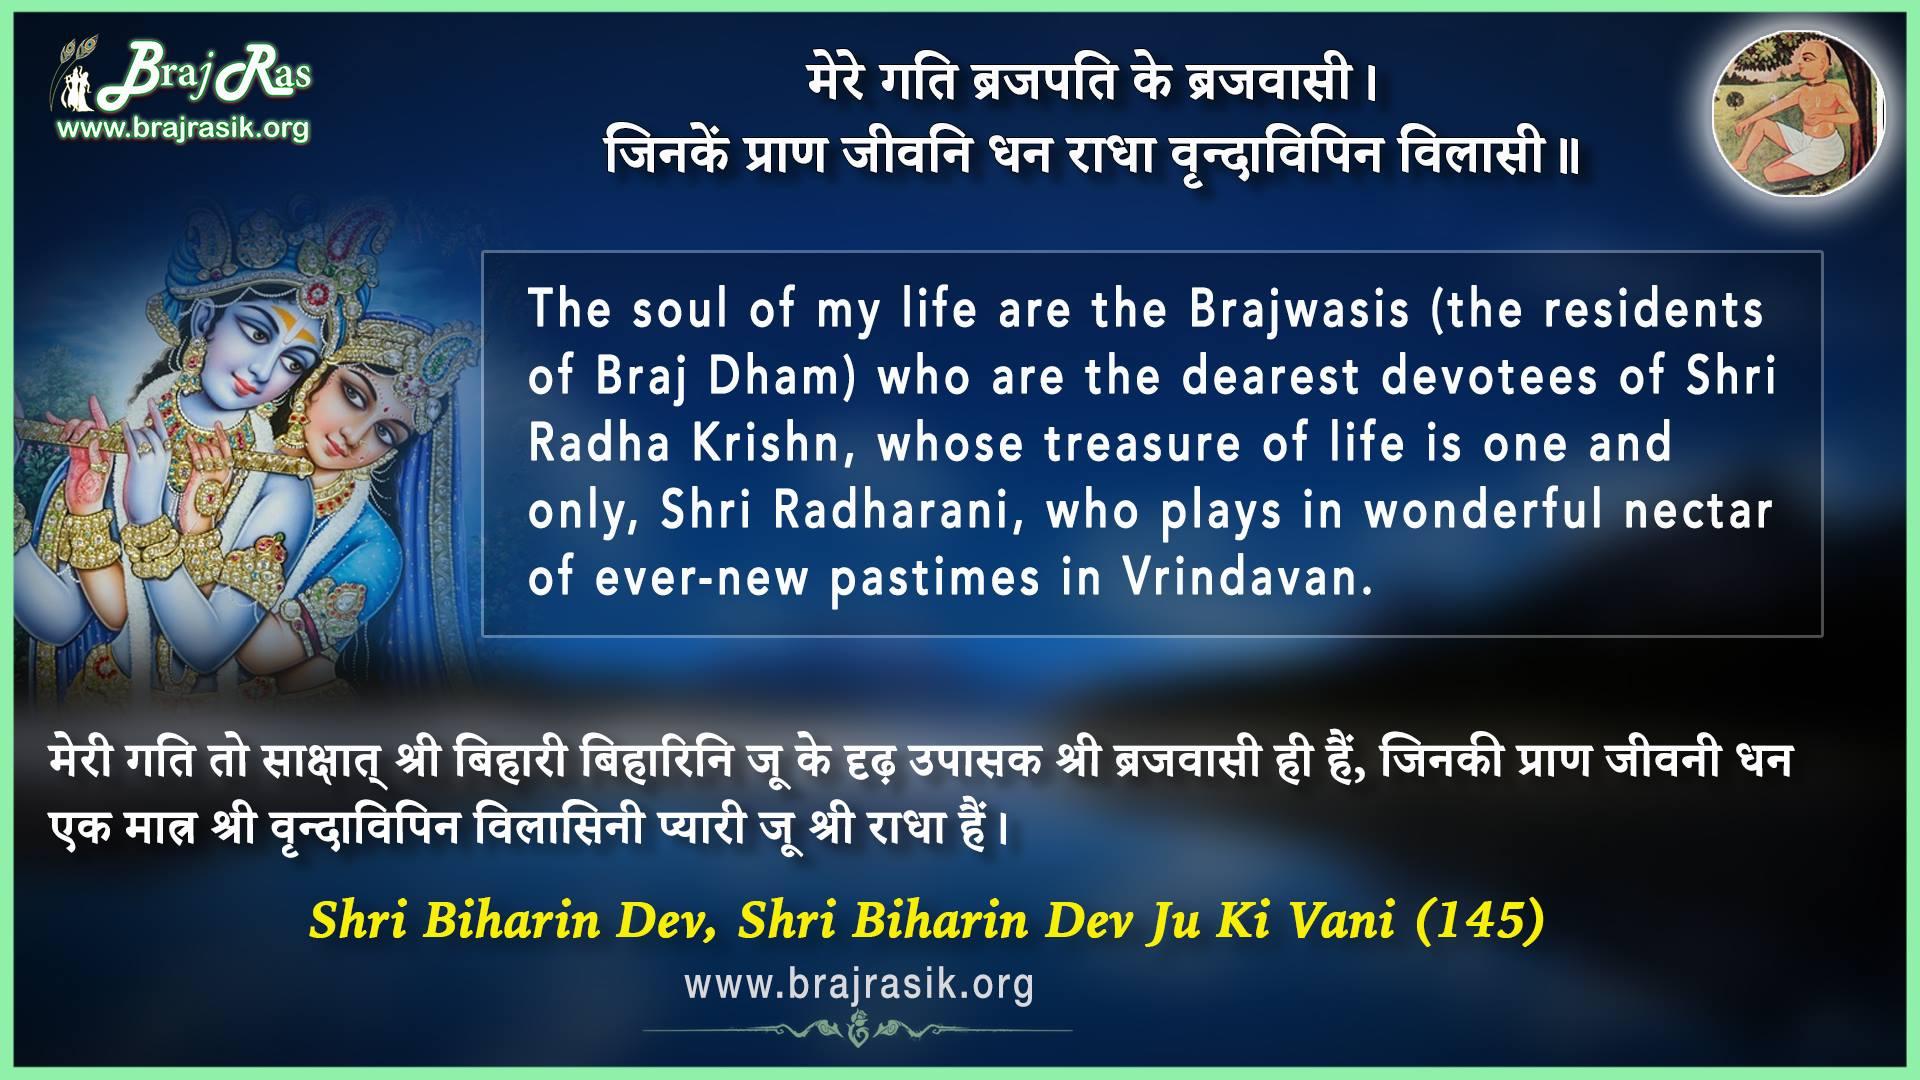 Mere Gati Brajpati Ke Brajwasi - Shri Biharin Dev from Shri Biharin Dev Ji Ki Bani (145)